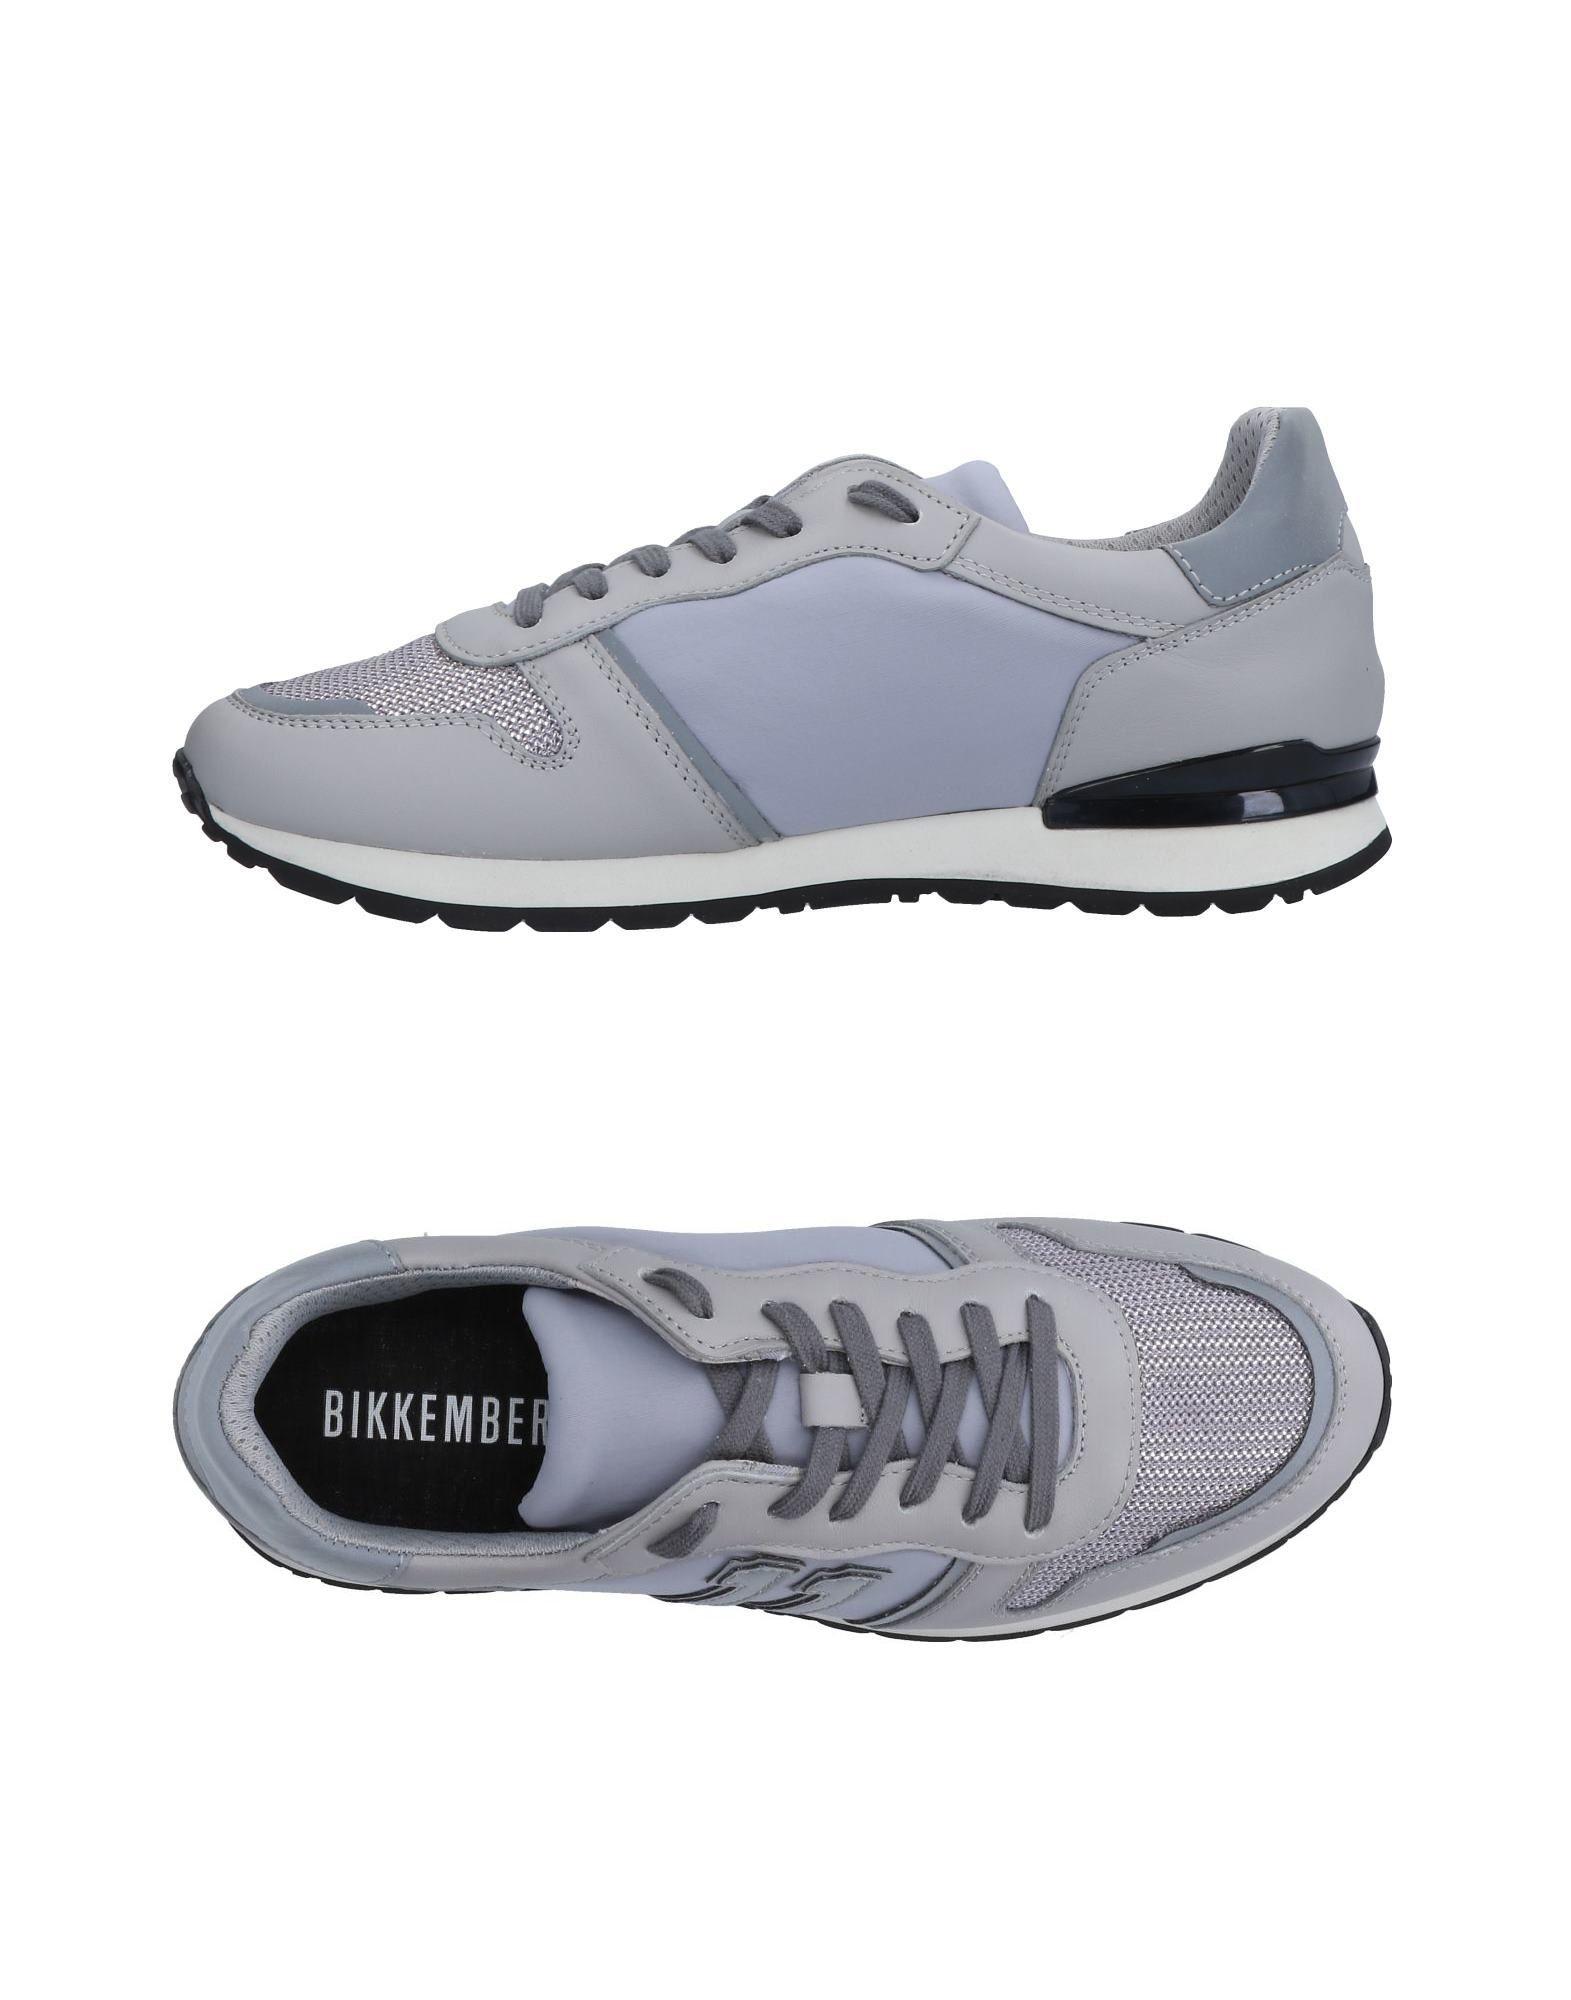 Moda Sneakers Bikkembergs Donna - 11521116SL 11521116SL - 9dc5f9